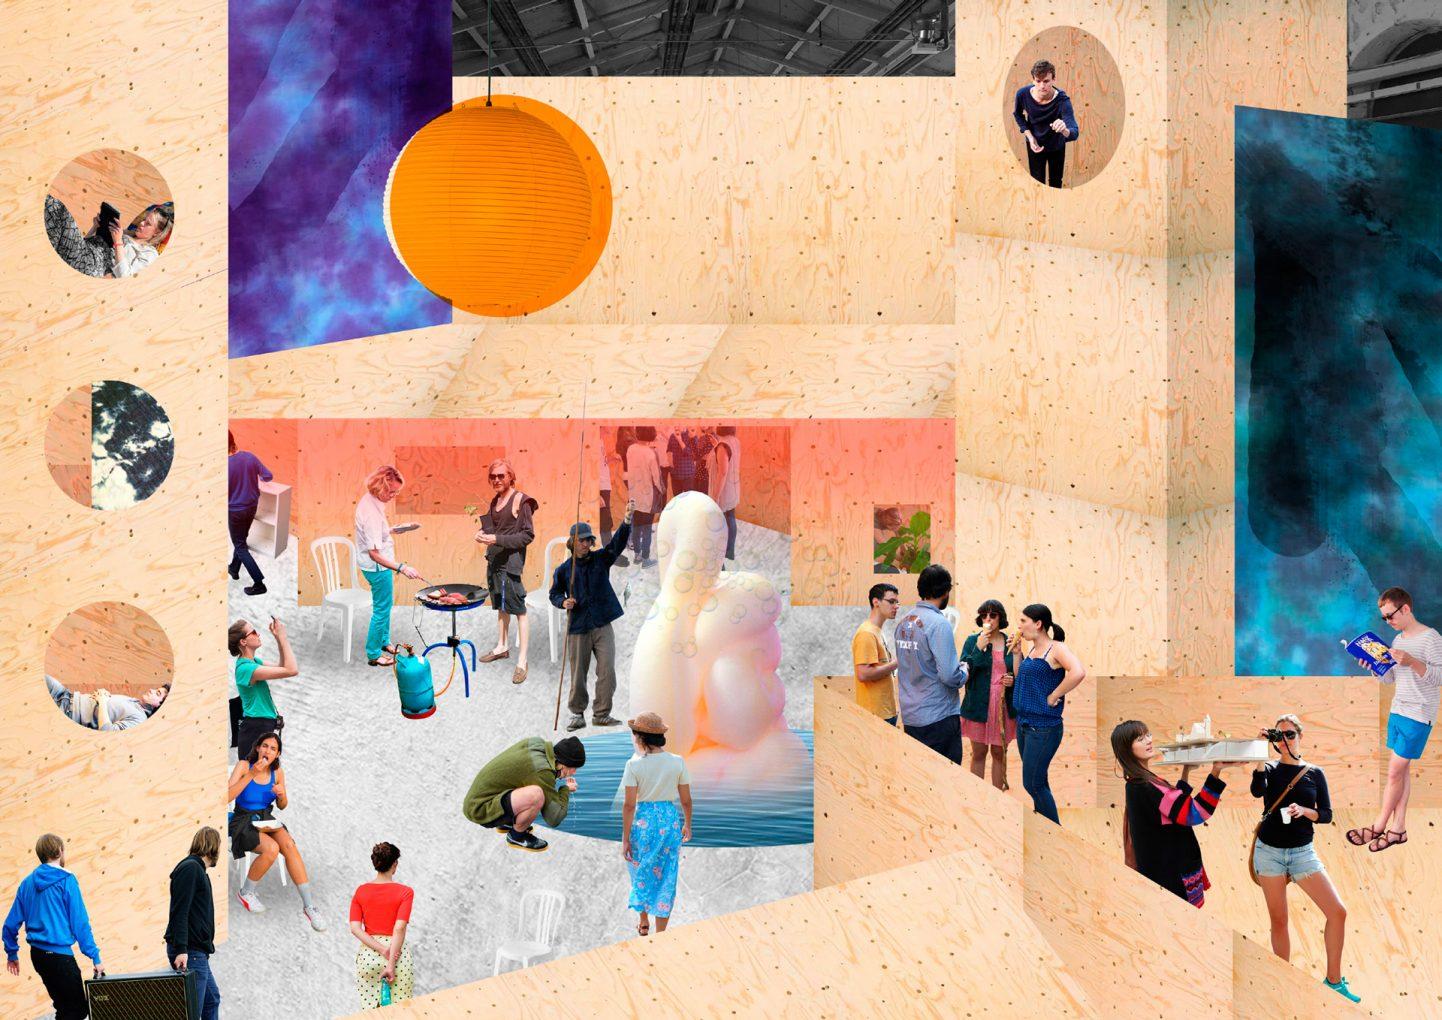 stefania in Biennale Internationale Design Saint-Étienne 2019 Best Exhibitions biennale internationale design saint-Étienne 2019 best exhibitions BIENNALE INTERNATIONALE DESIGN SAINT-ÉTIENNE 2019 BEST EXHIBITIONS stefania